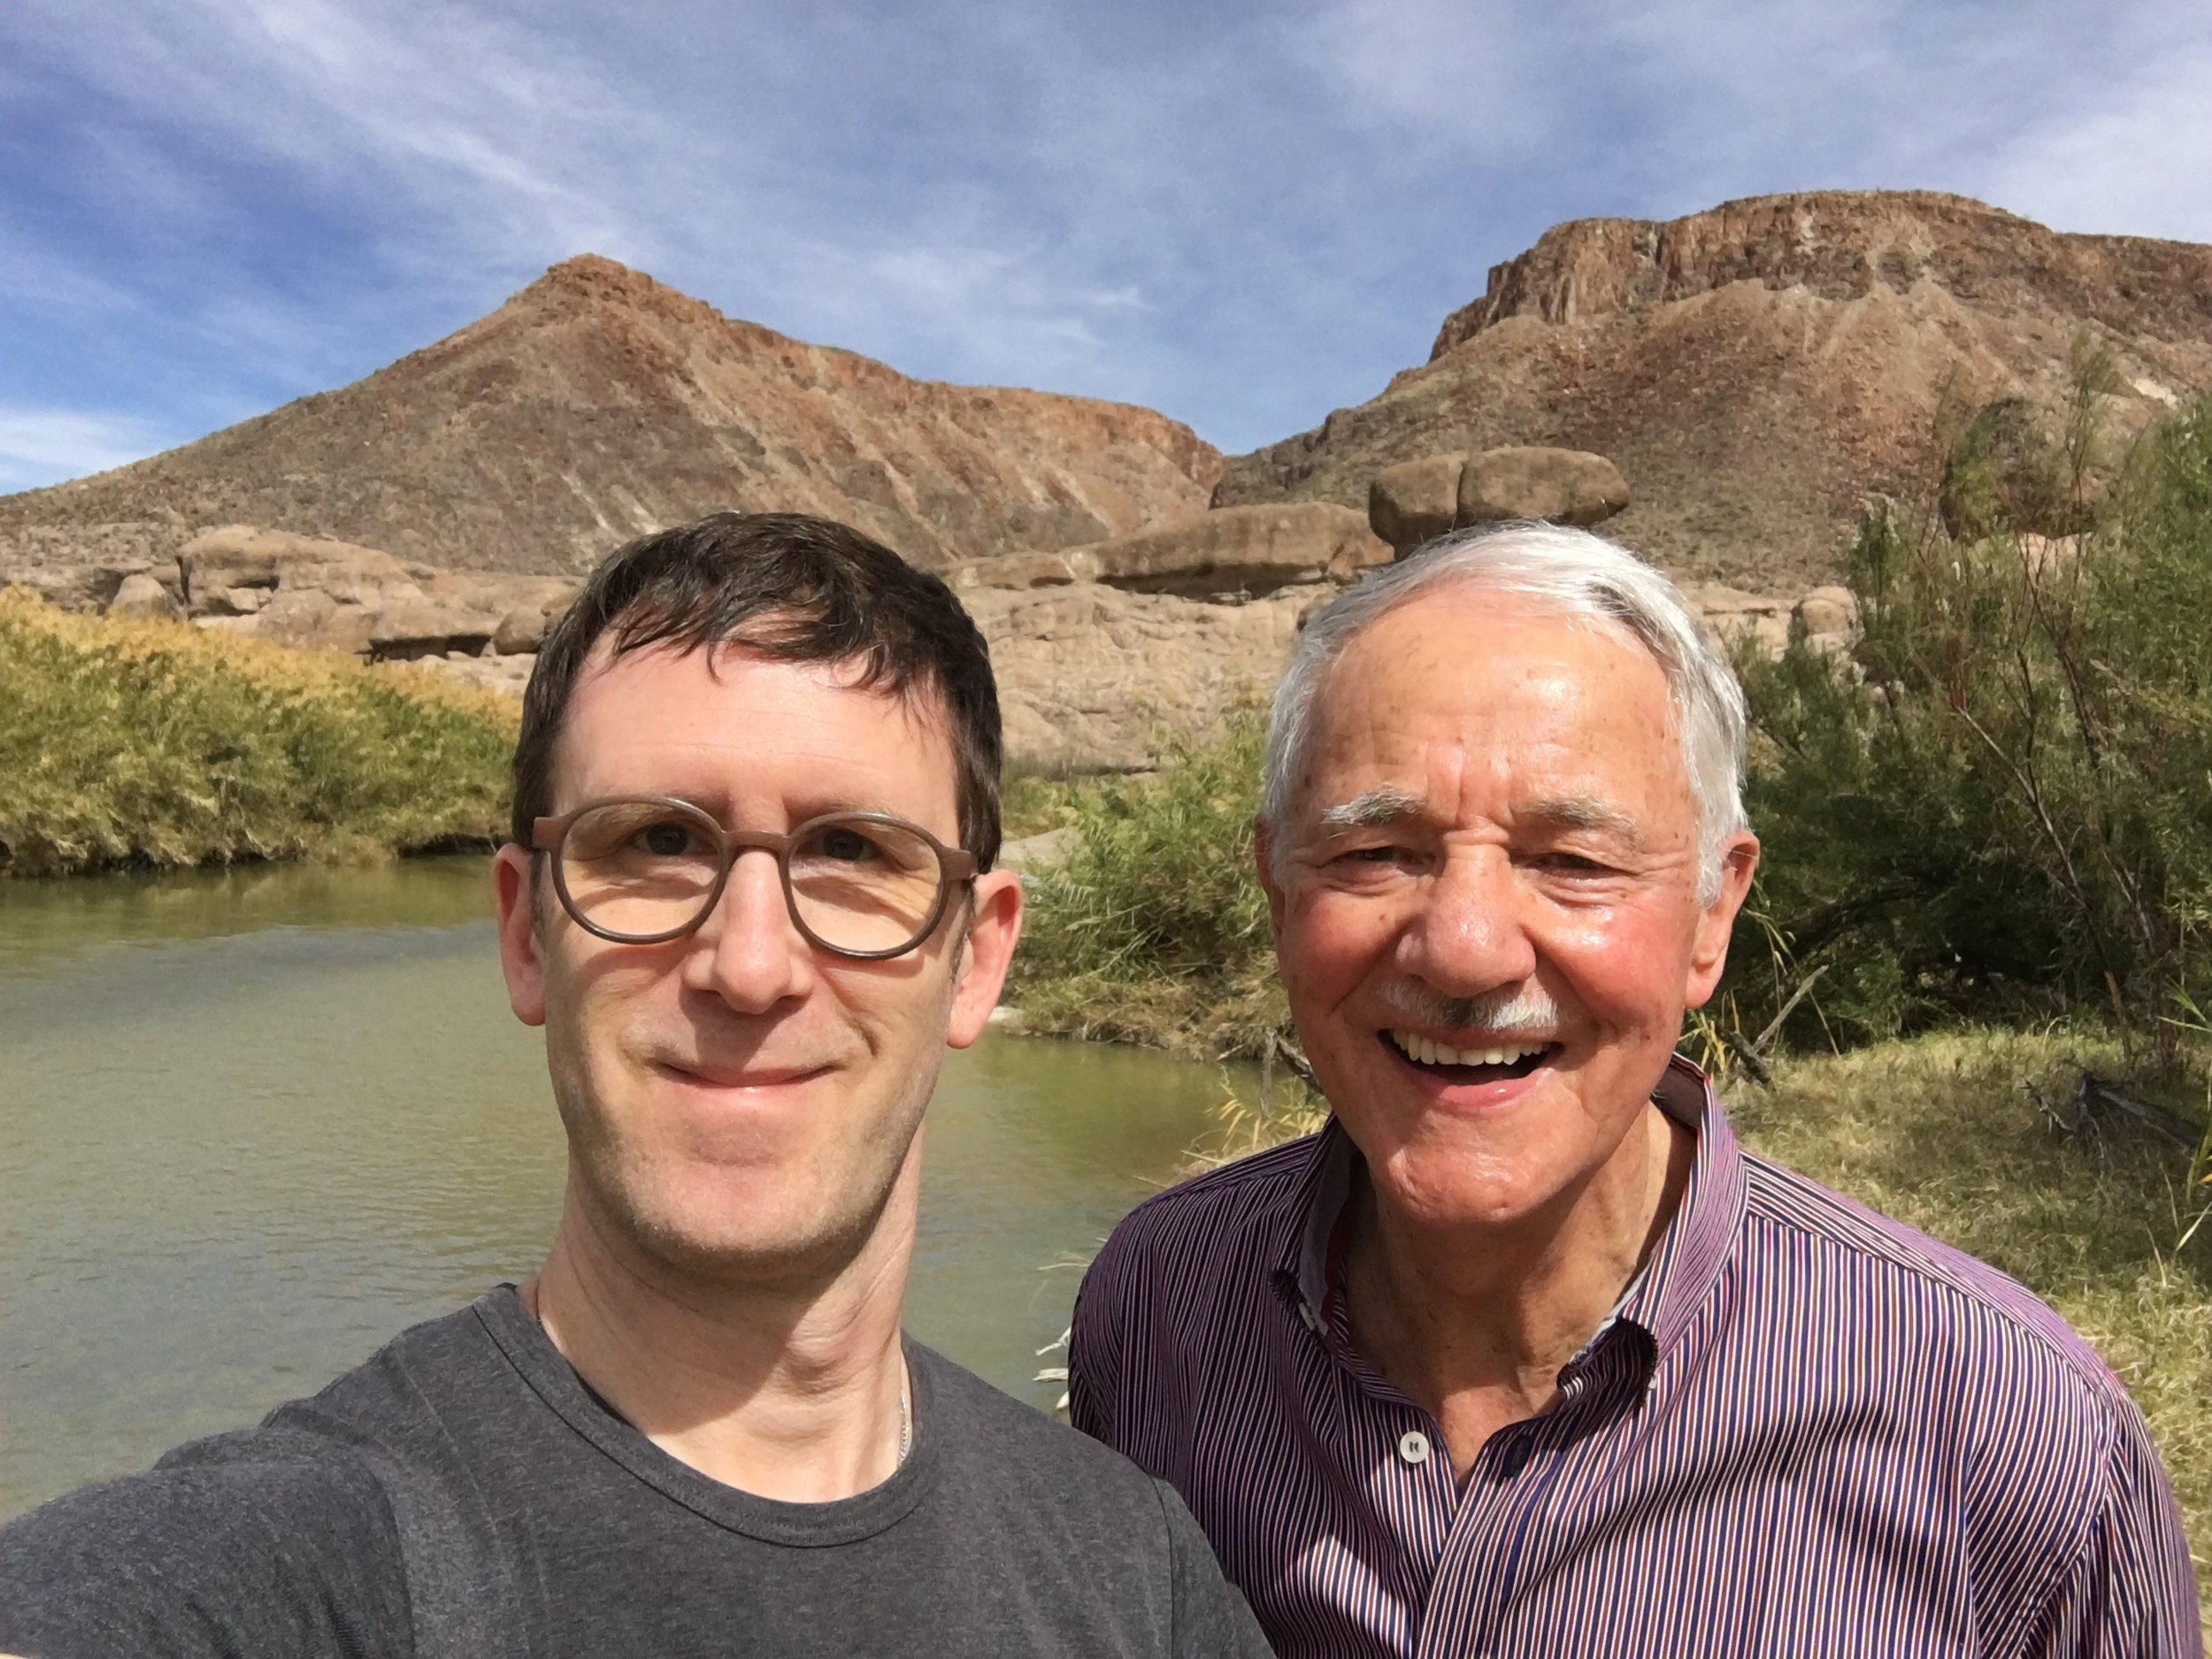 John Silvis and Mr. Karlheinz Essl on the Rio Grande, bordering Mexico